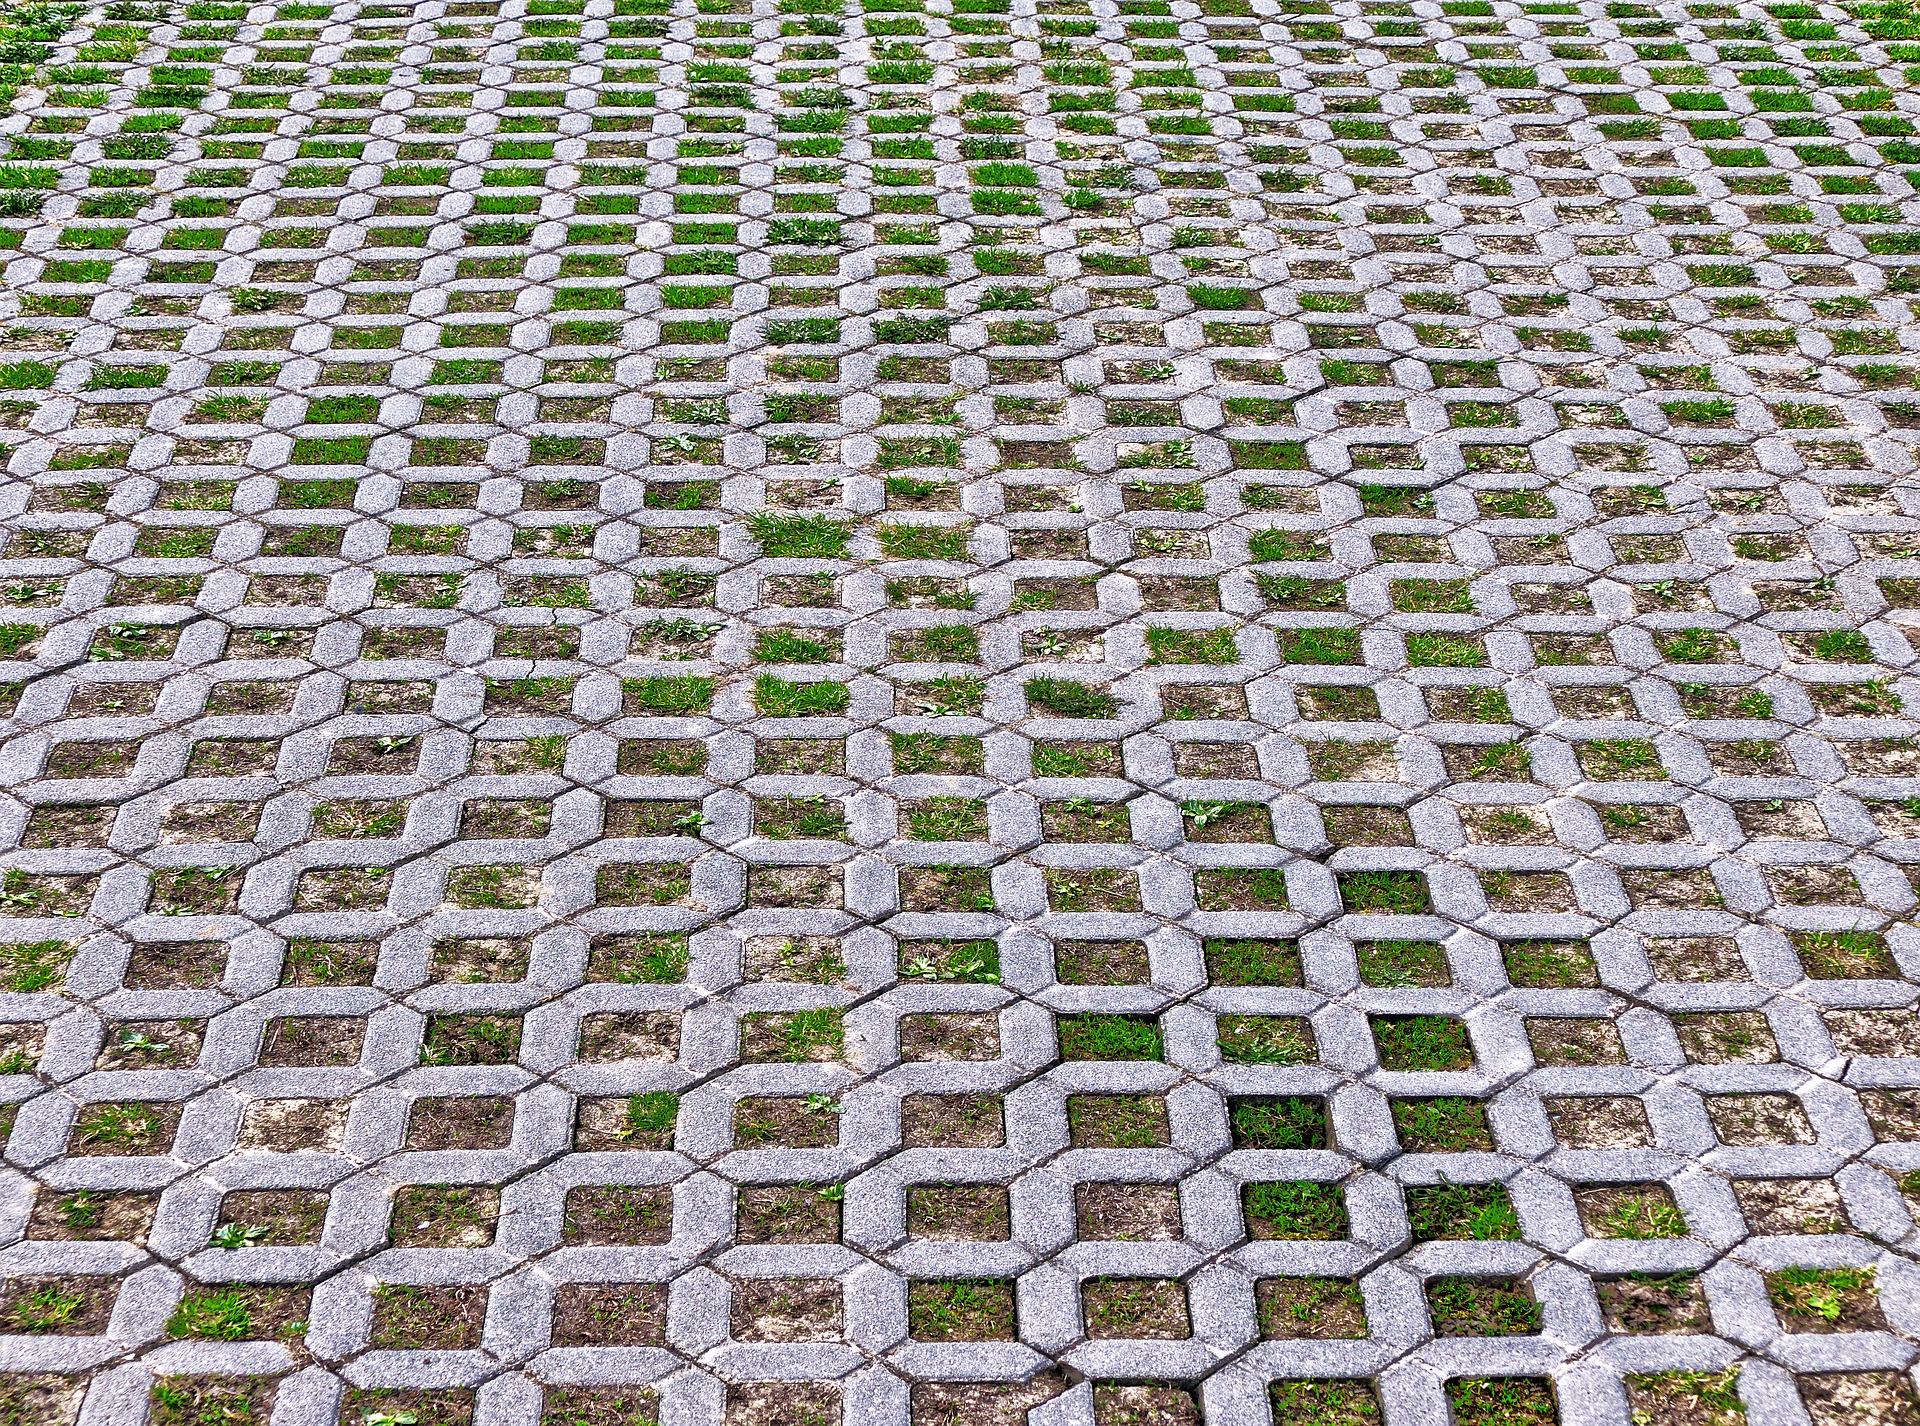 11-lawn-stones-3311513_1920_dalle gazon